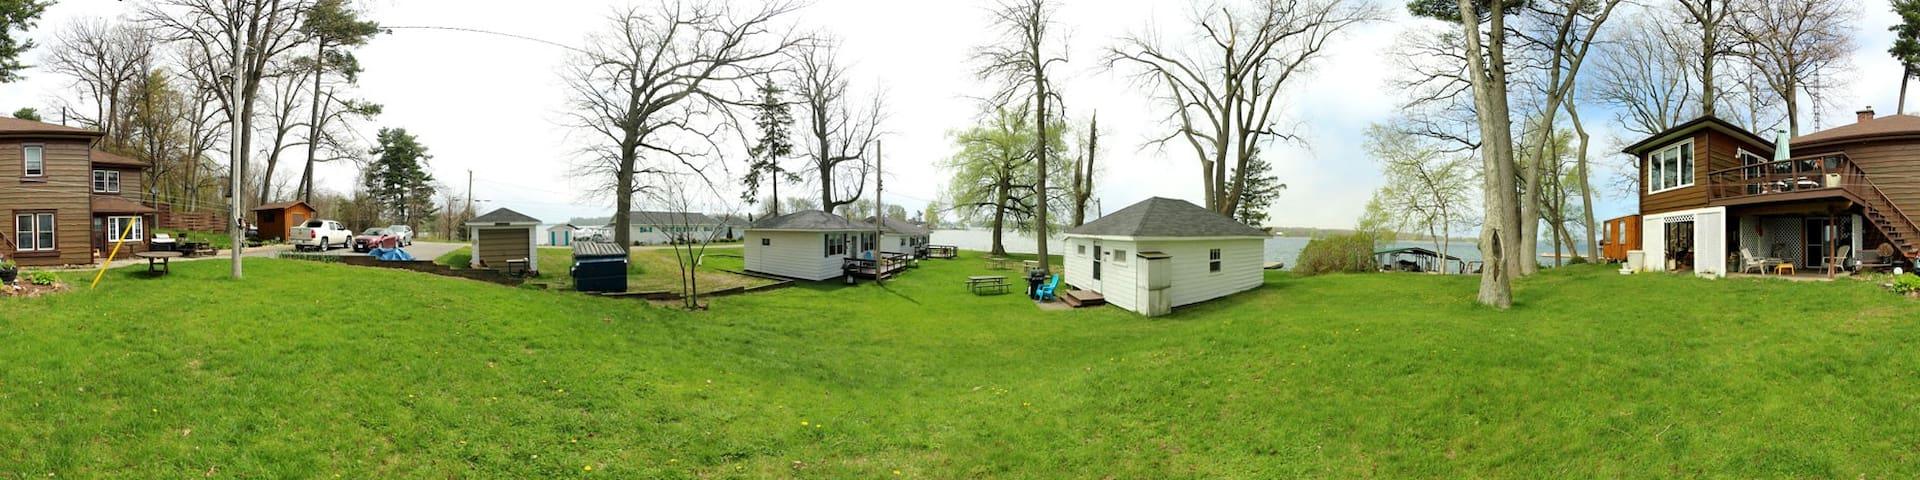 The Pines Riverfront Cottages - Cottage 1